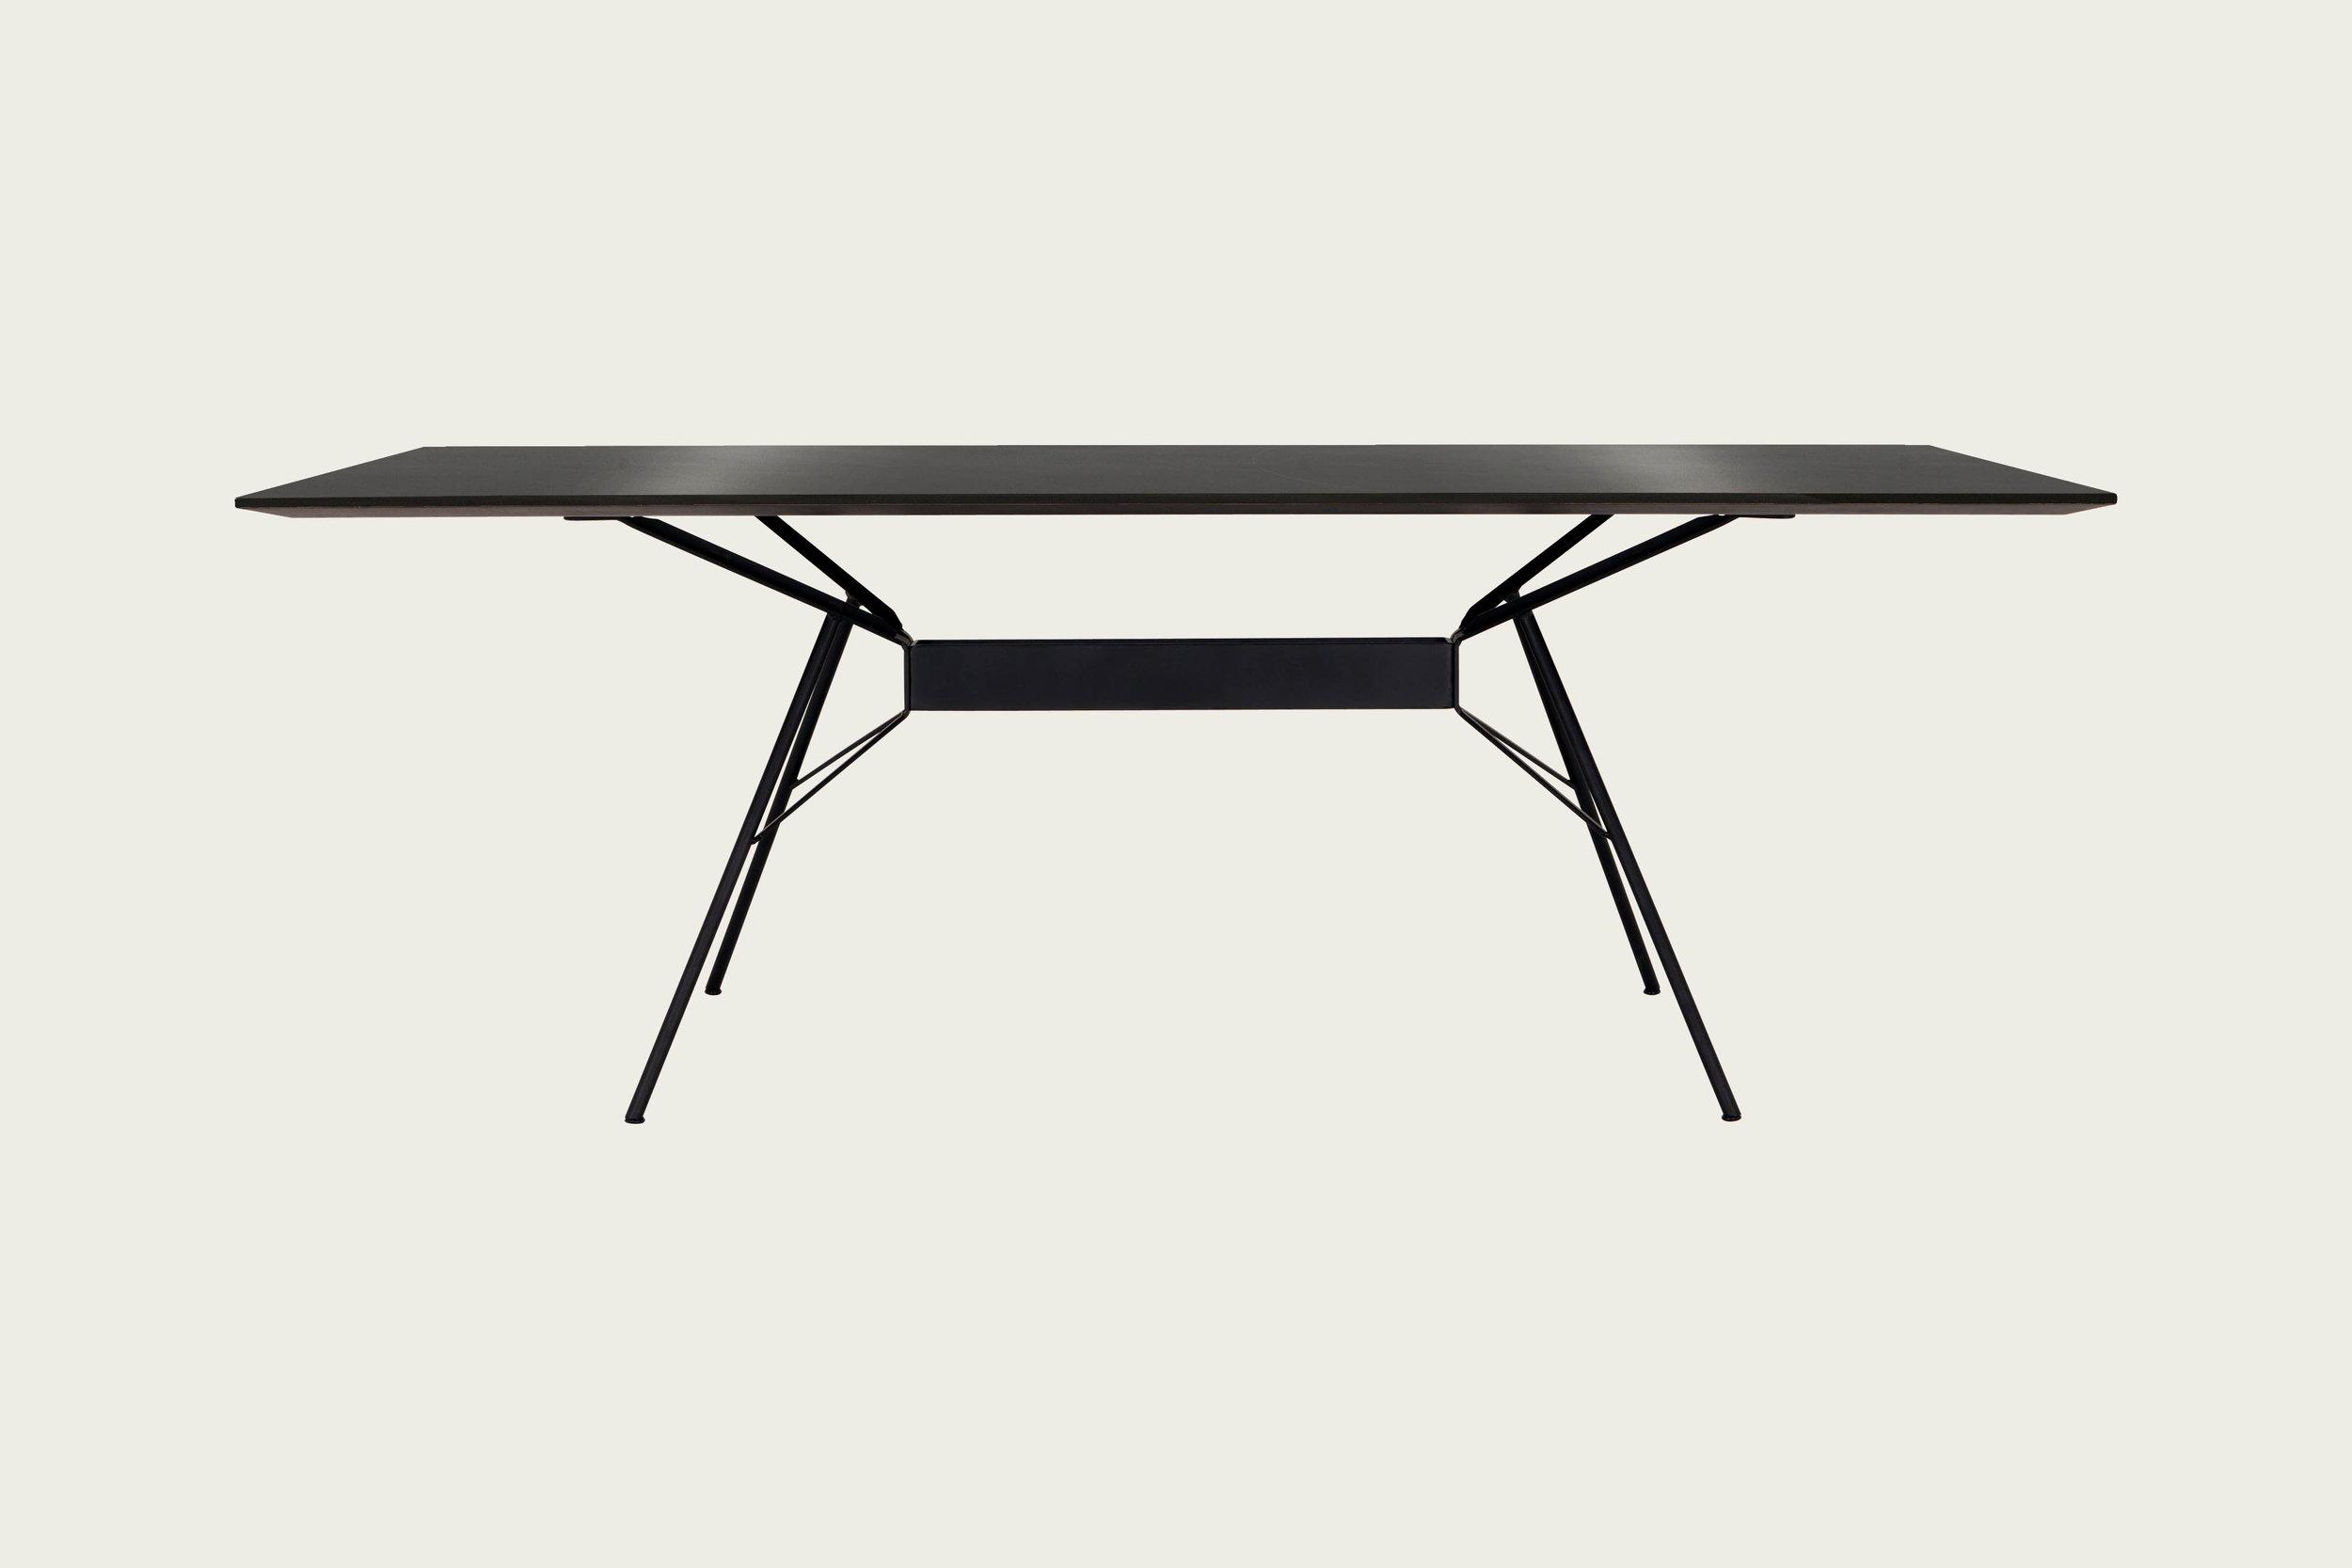 225010_BRIDGE rectangular dining table_black_black_highres (1) kopier.jpg